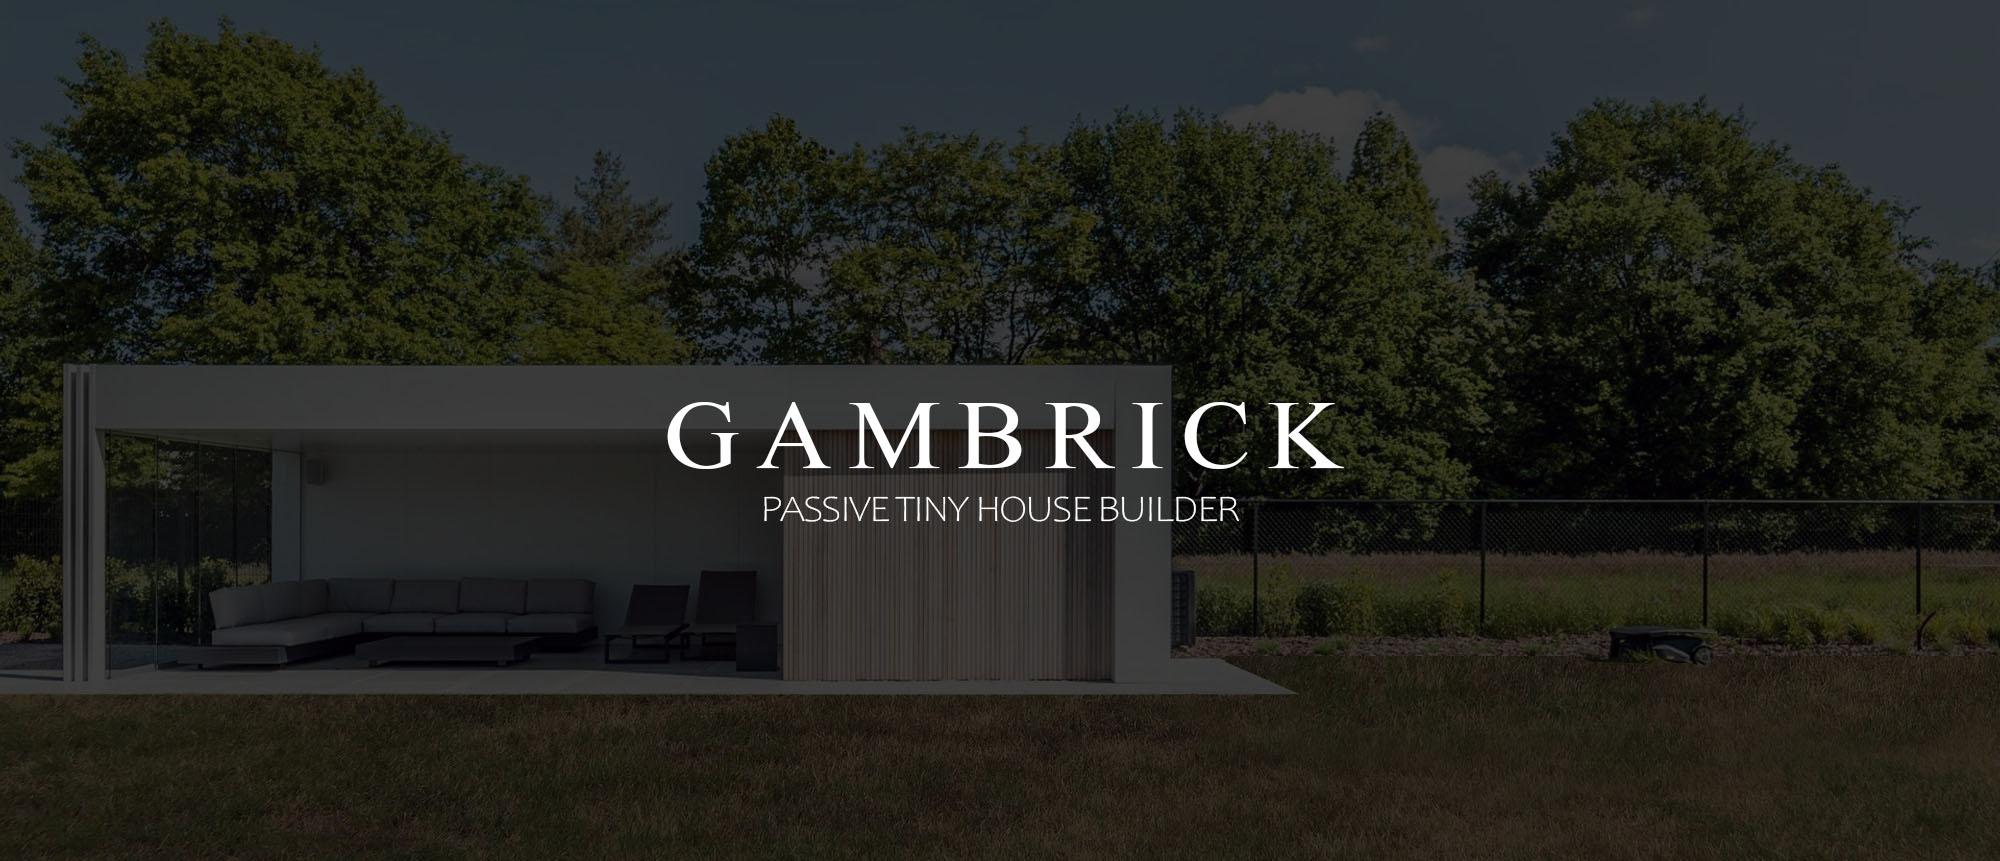 Passive Tiny House Builder Ultra Energy Efficient Tiny Homes